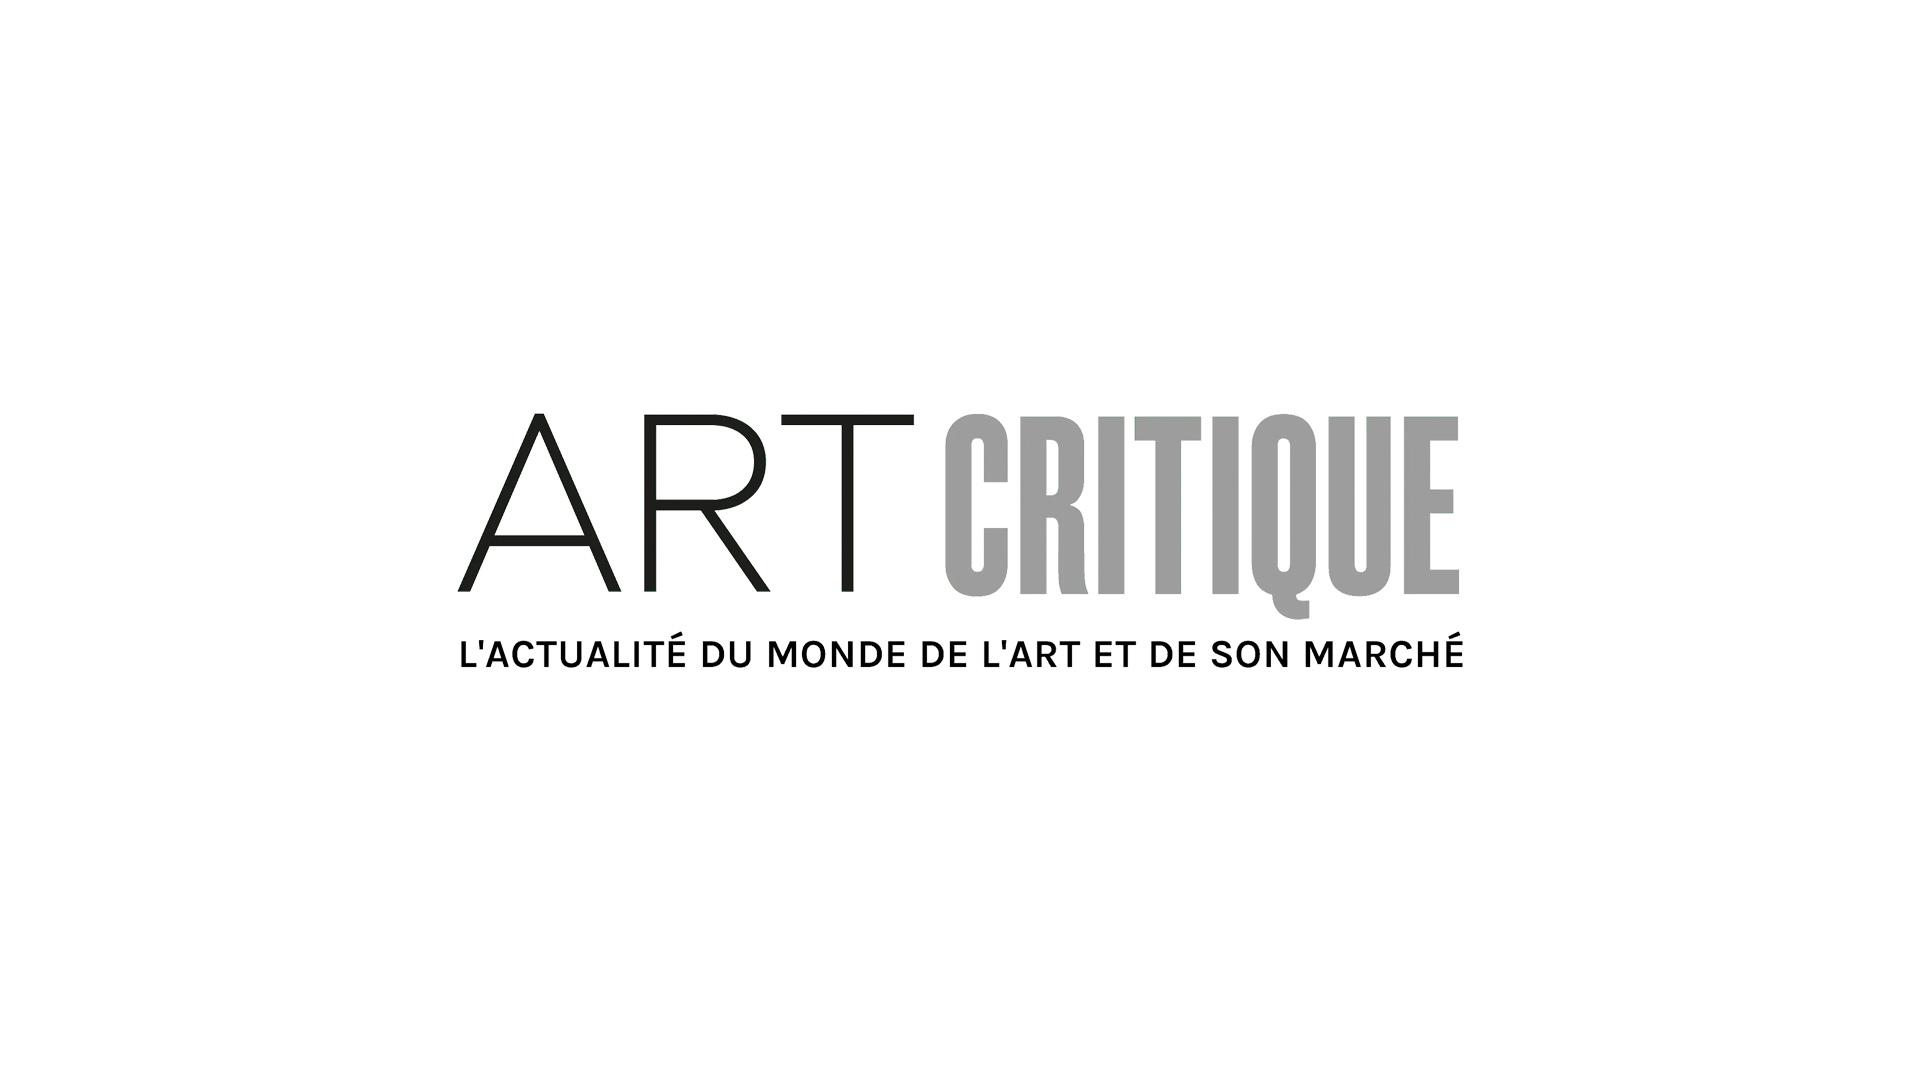 Descendants of Frederick Douglass, Elizabeth Cady Stanton, and Thomas Jefferson partake is photographic series recreating their ancestors